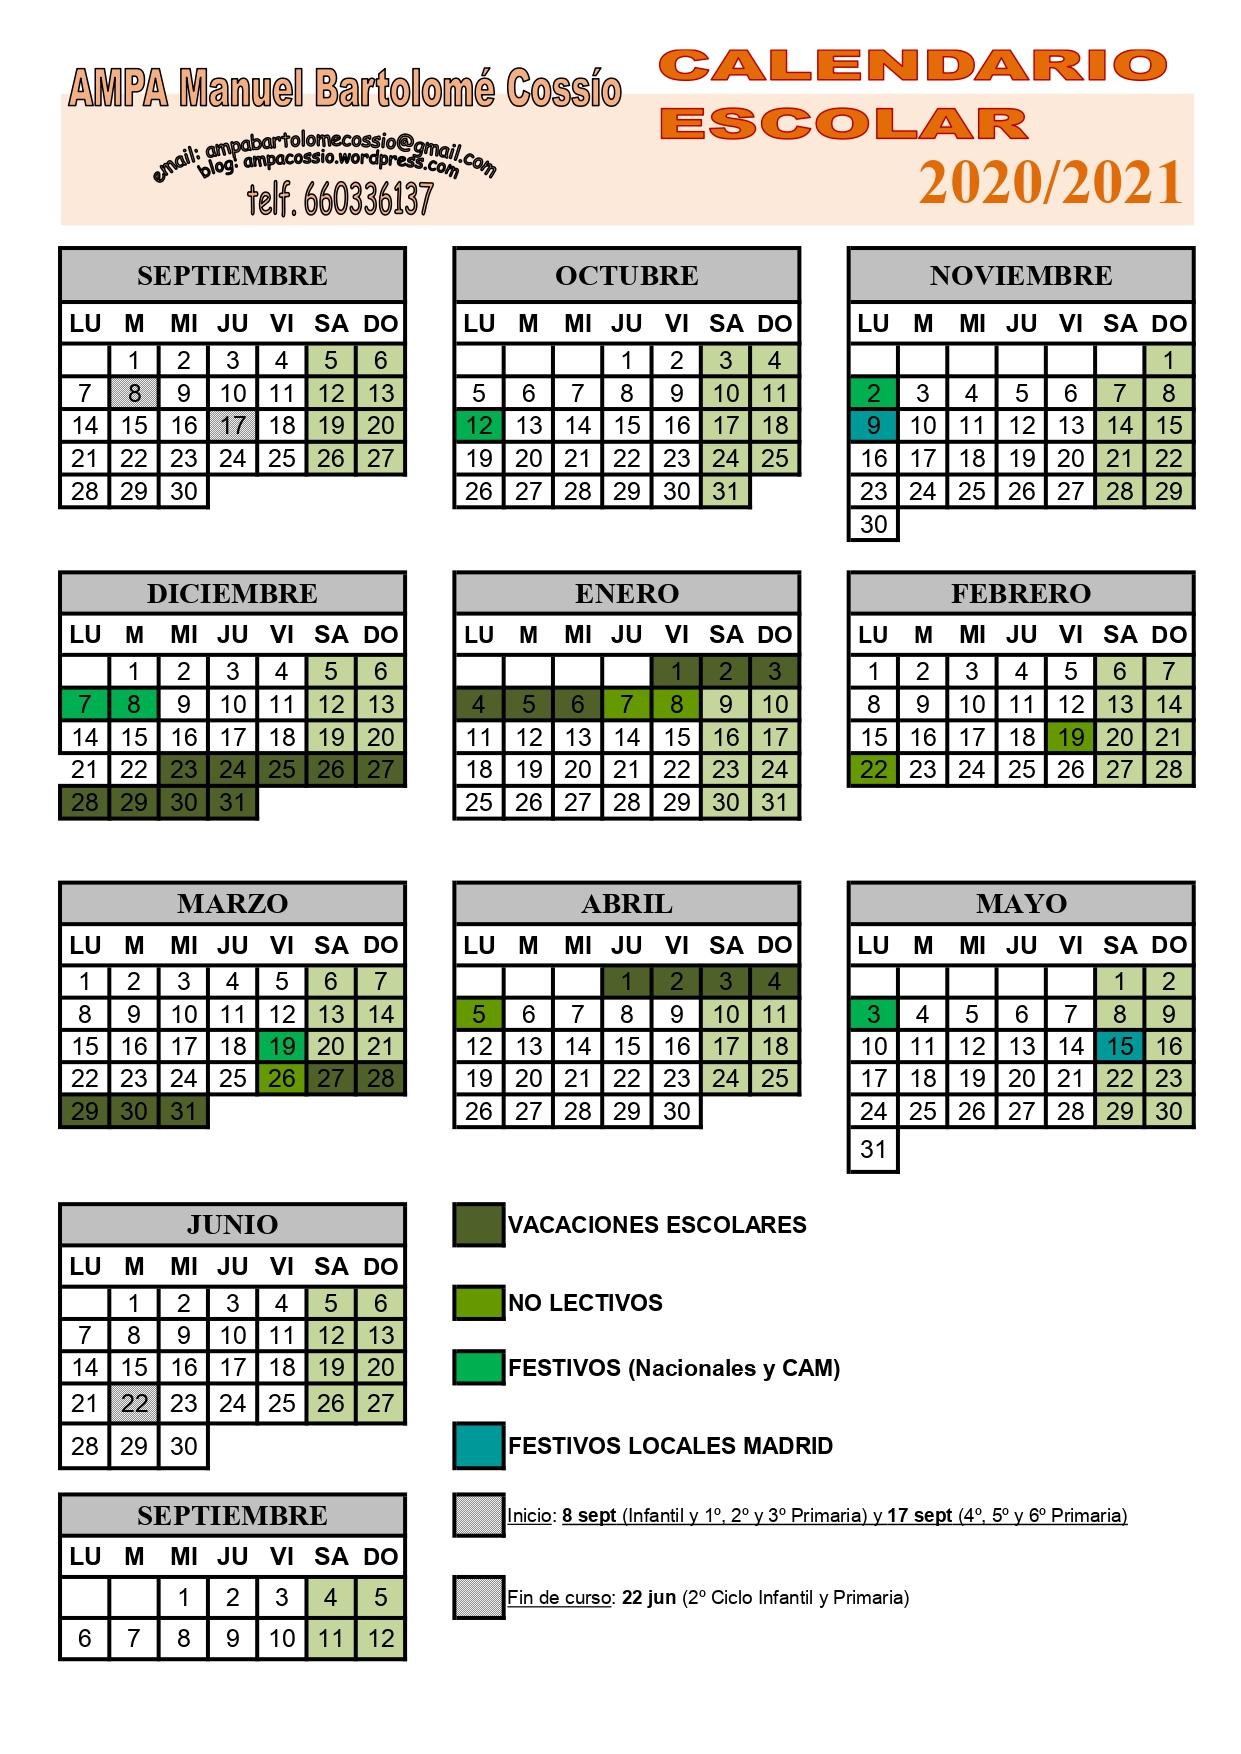 Calendario Escolar 2020-2021 | Ampacossio with Calendario Escolar WordPress